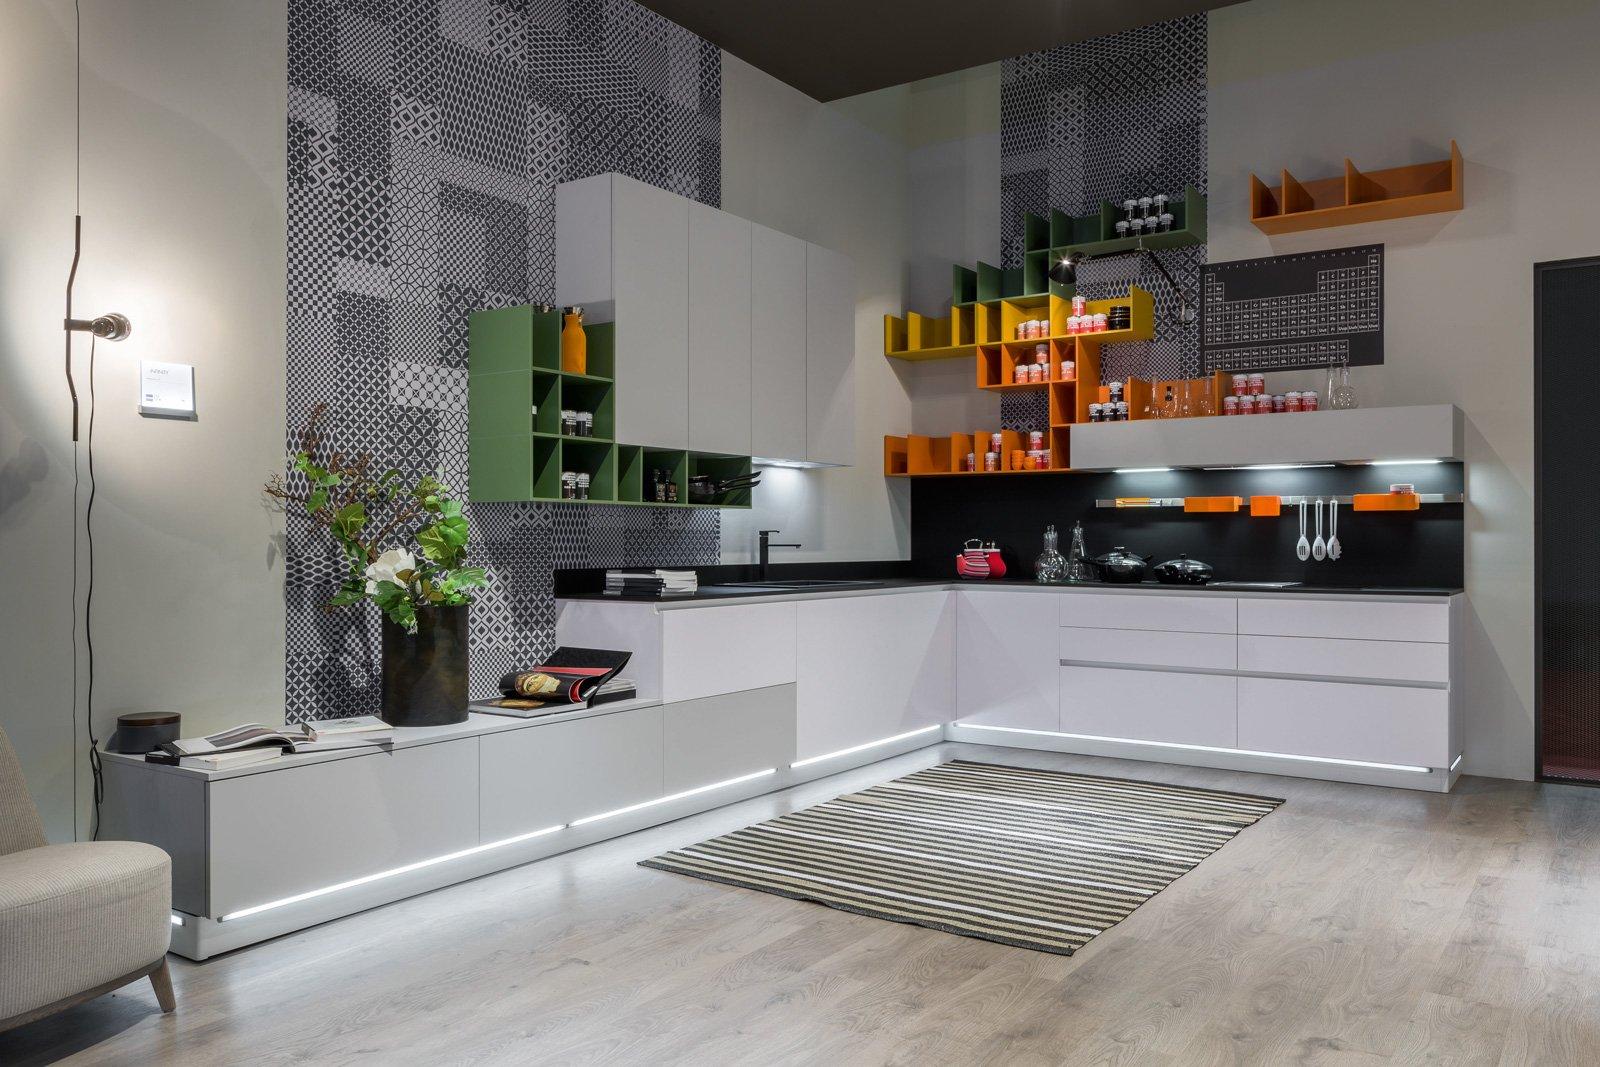 Beautiful Cose Per La Cucina Ideas - Moronia.us - moronia.us